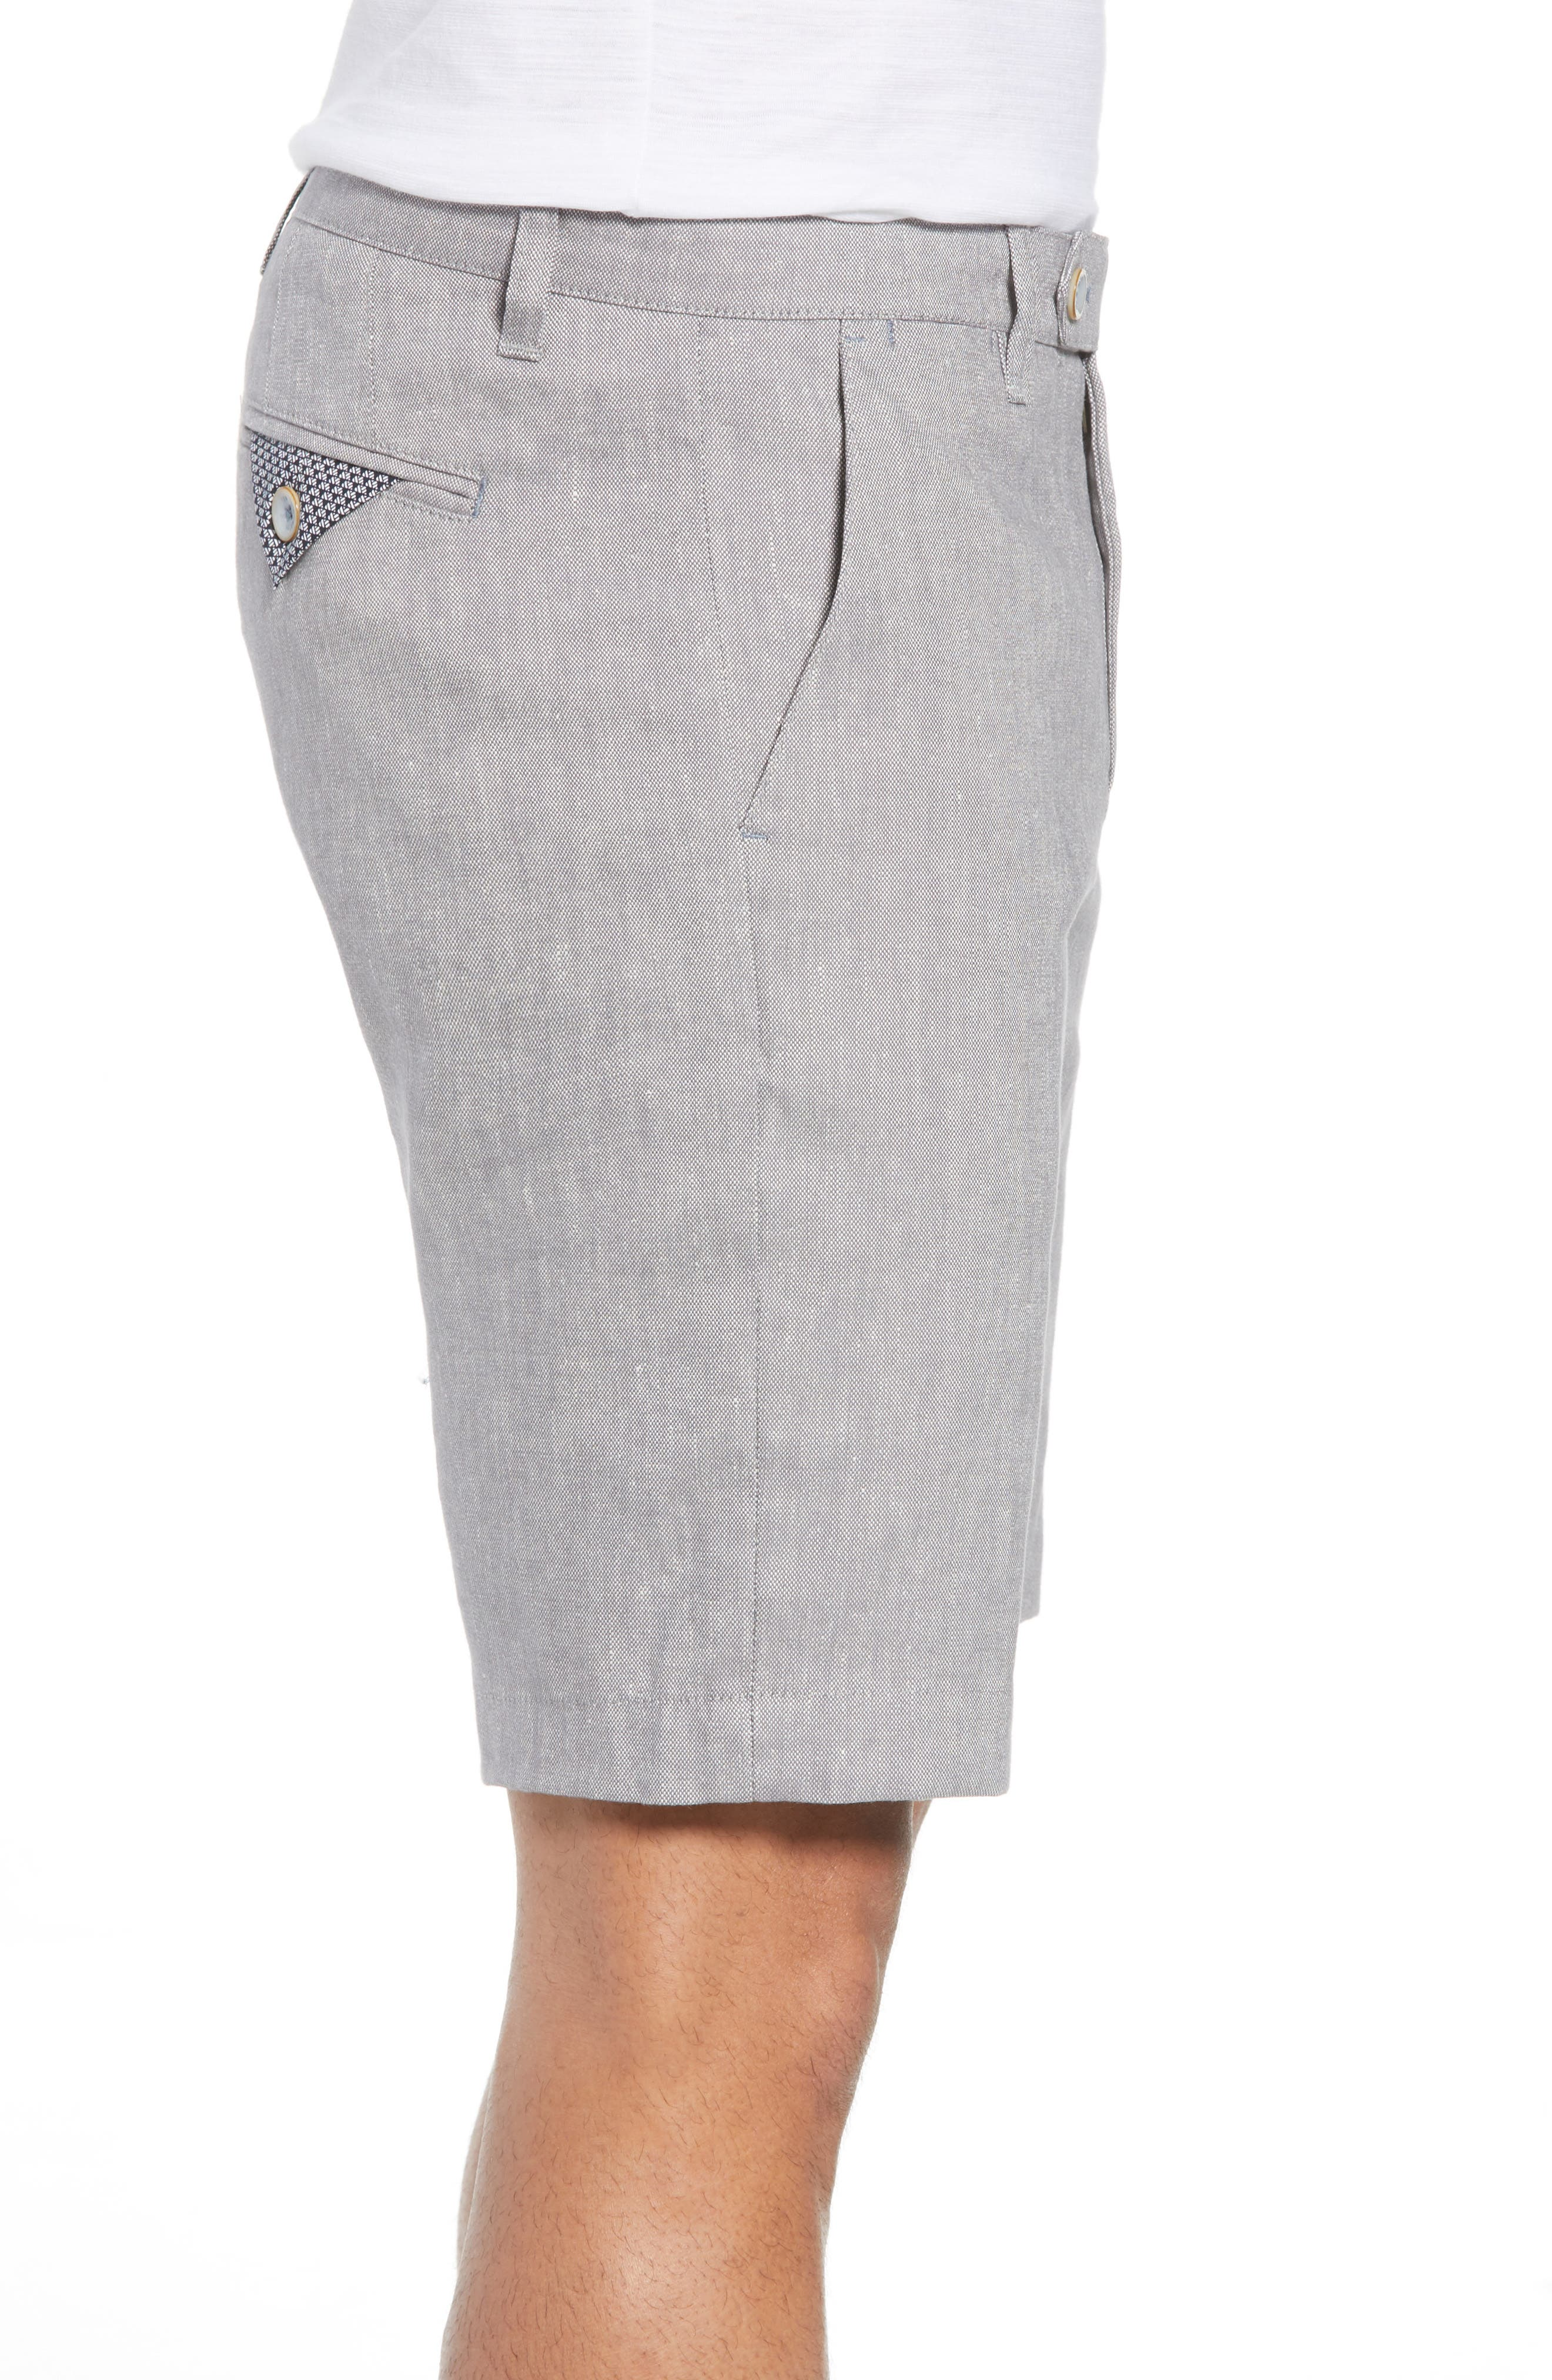 Newshow Flat Front Stretch Cotton Blend Shorts,                             Alternate thumbnail 3, color,                             GREY